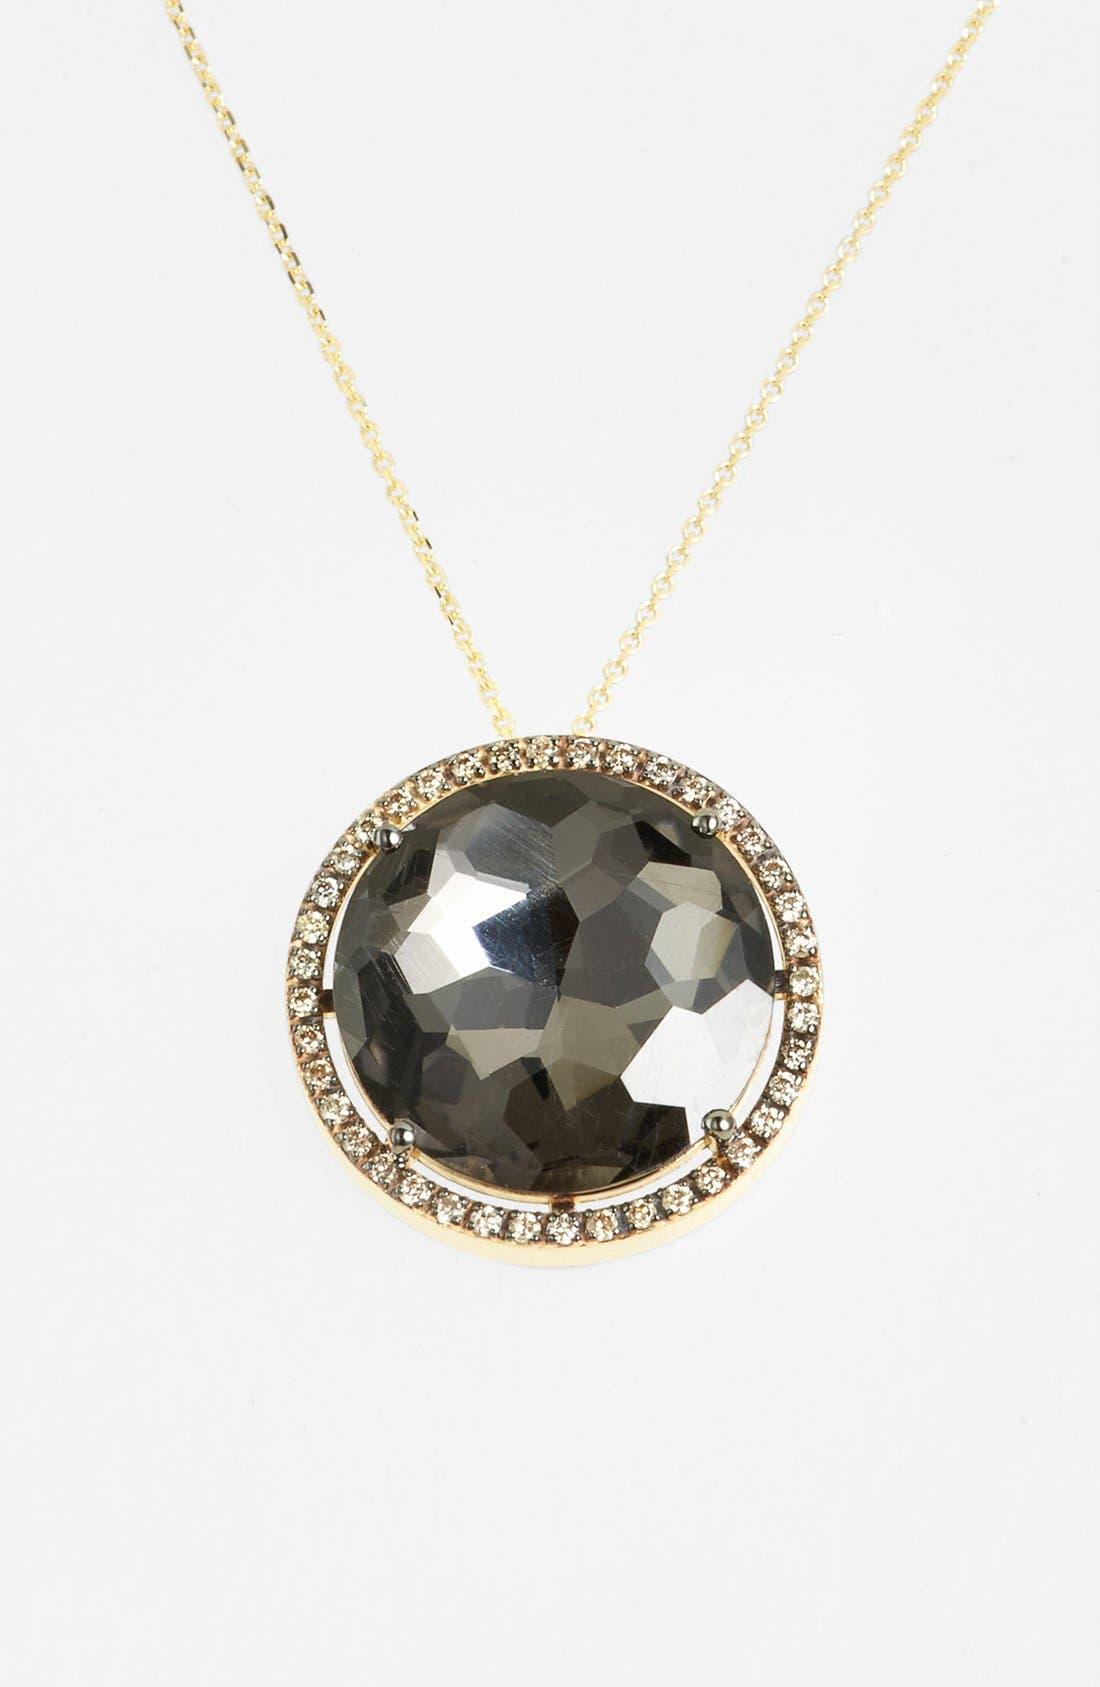 KALAN by Suzanne Kalan Diamond & Stone Pendant Necklace,                         Main,                         color, YELLOW GOLD/ BLACK QUARTZ